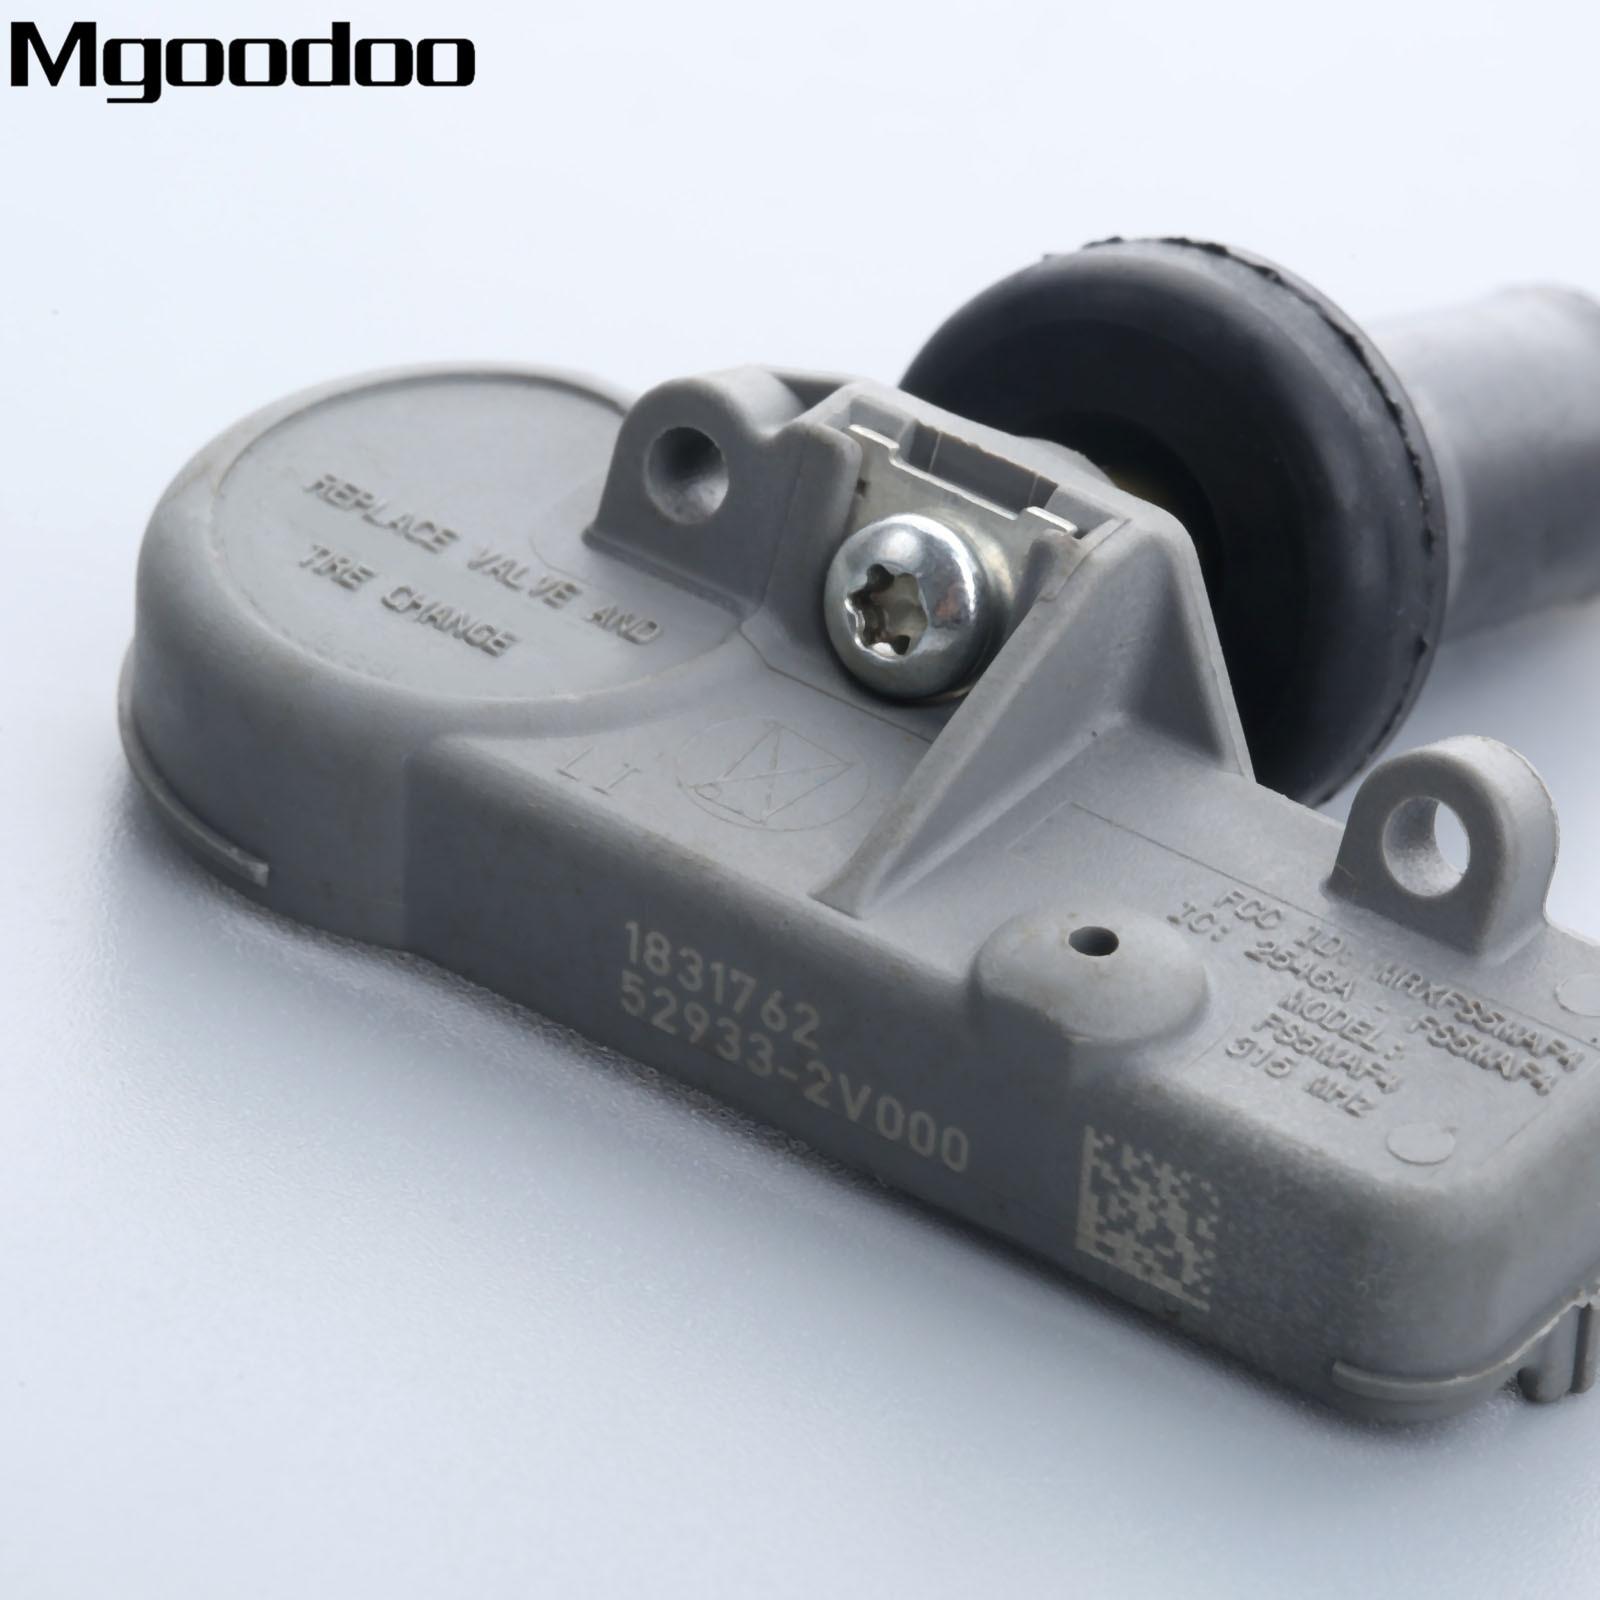 1Pc TPMS Fit For 2012-2016 Hyundai Veloster Tire Pressure Sensor 52933-2V000 US